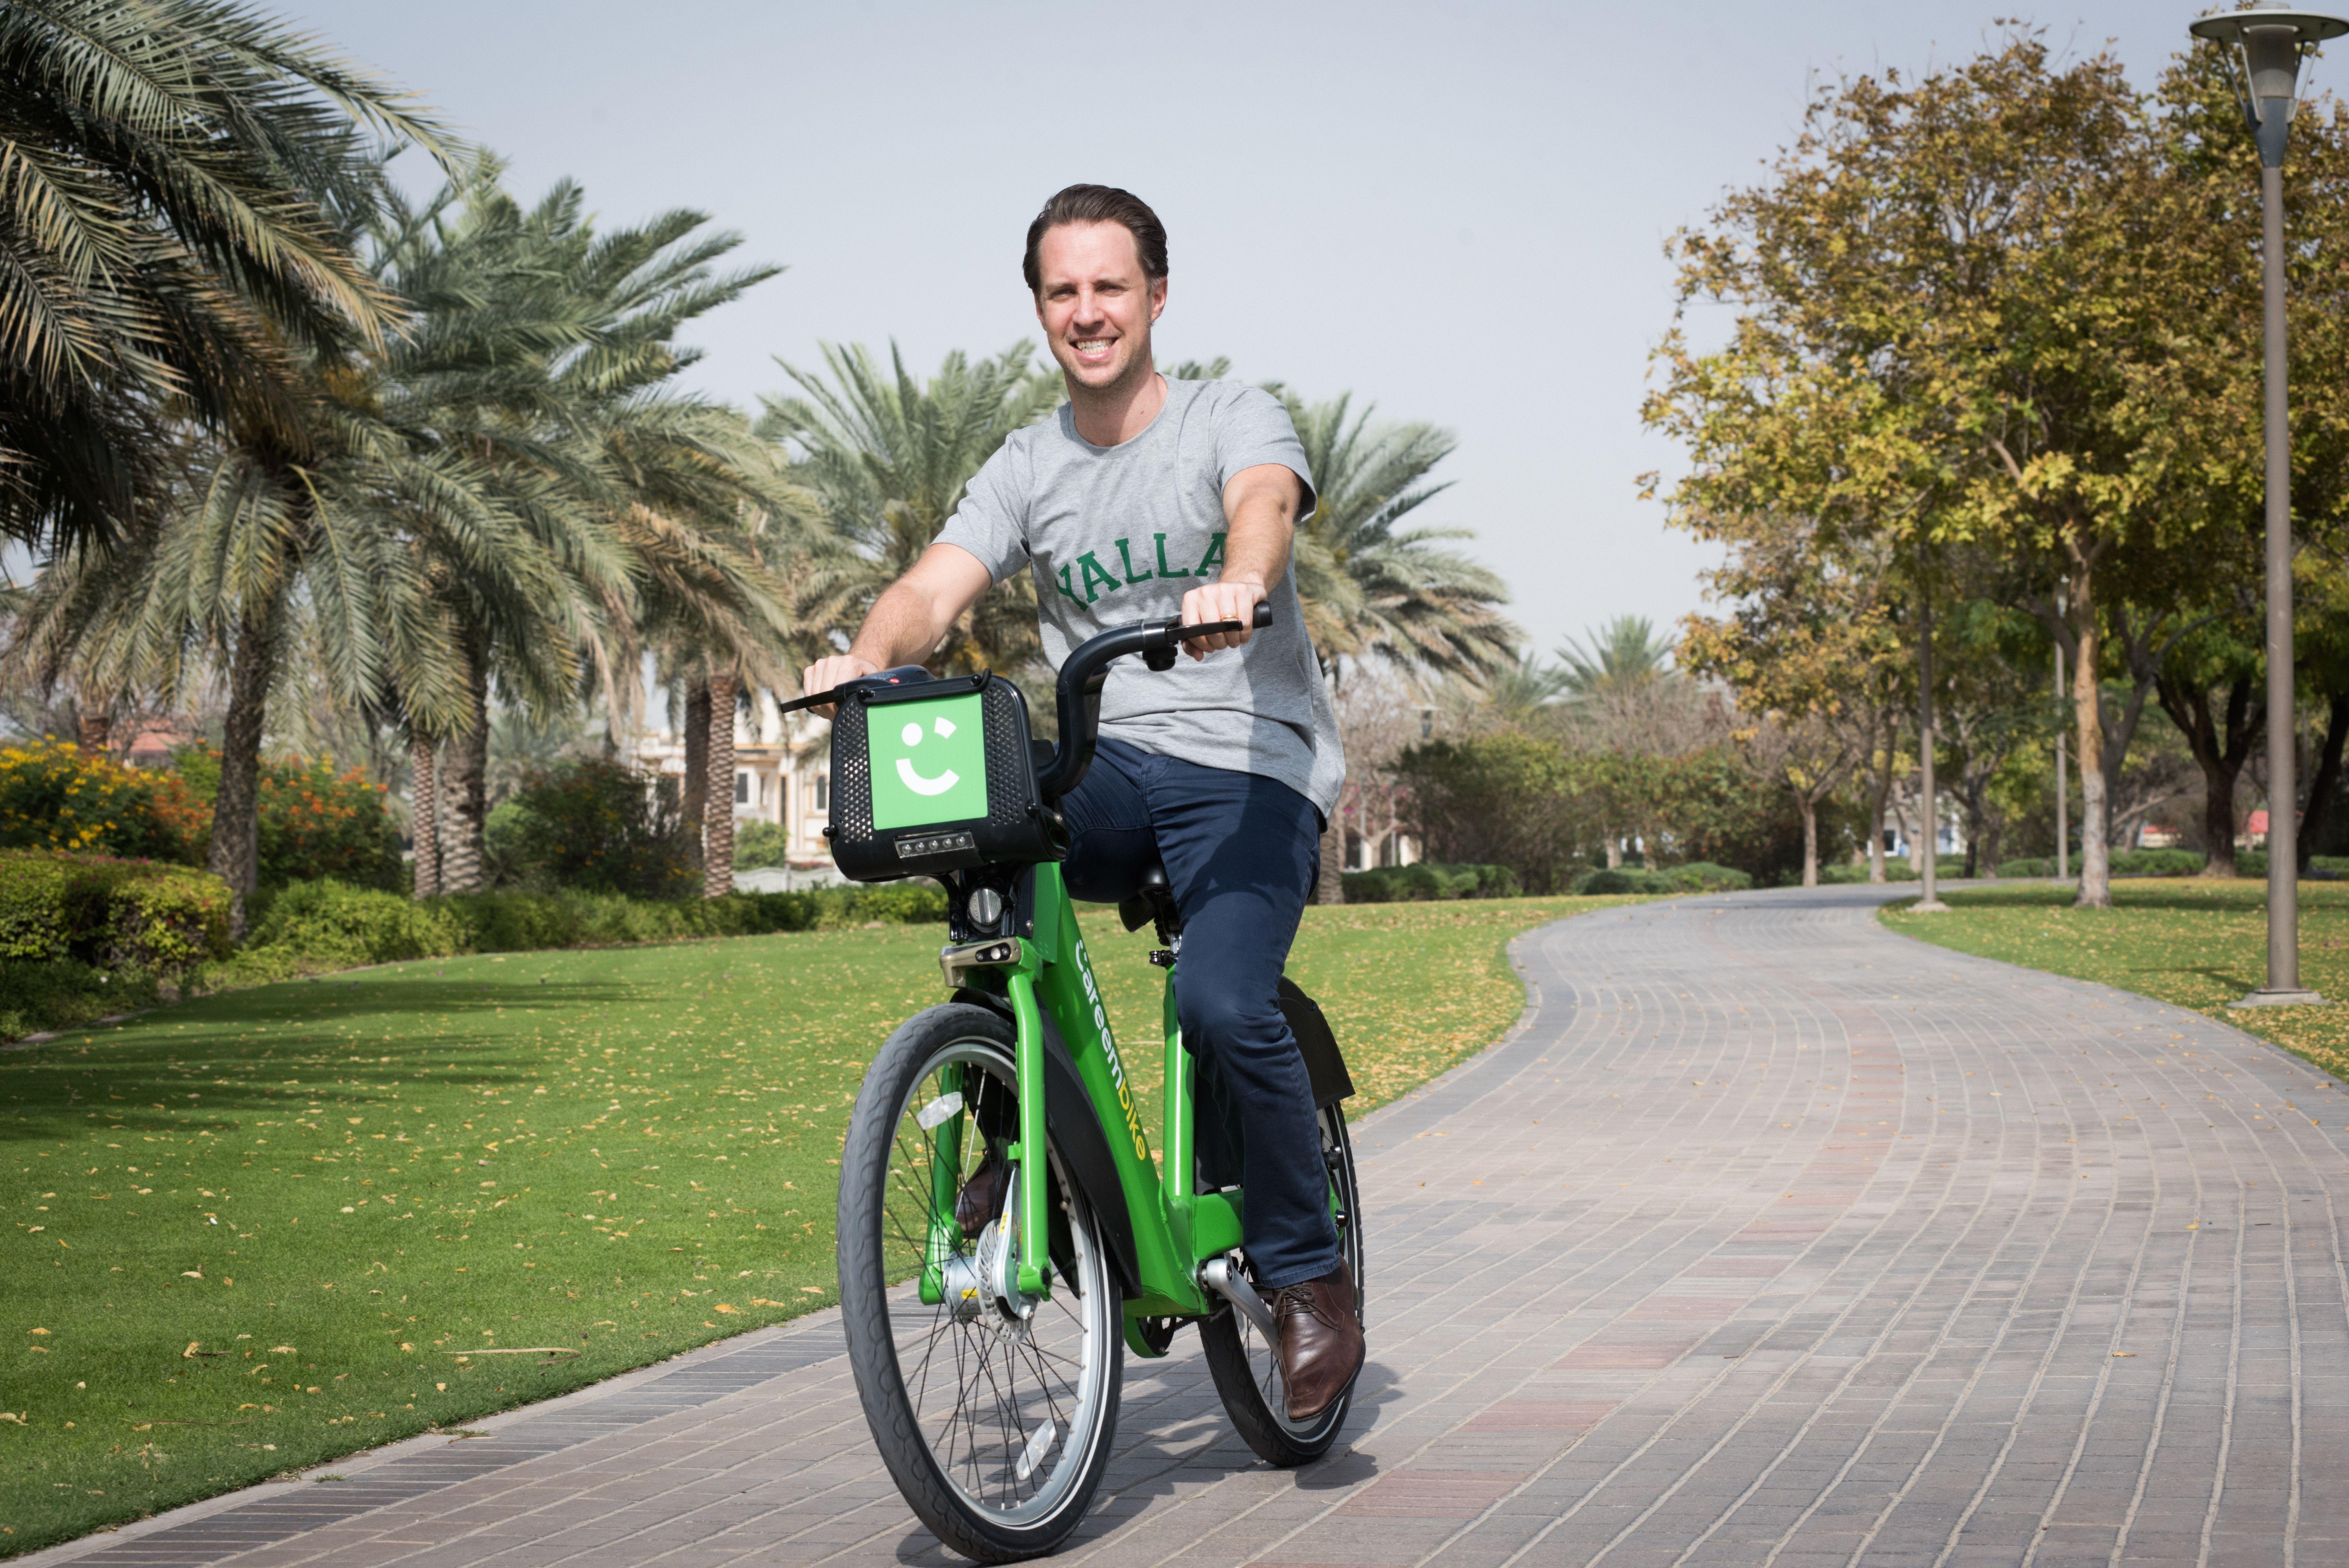 Careem acquires Abu Dhabi's Cyacle bike-share company